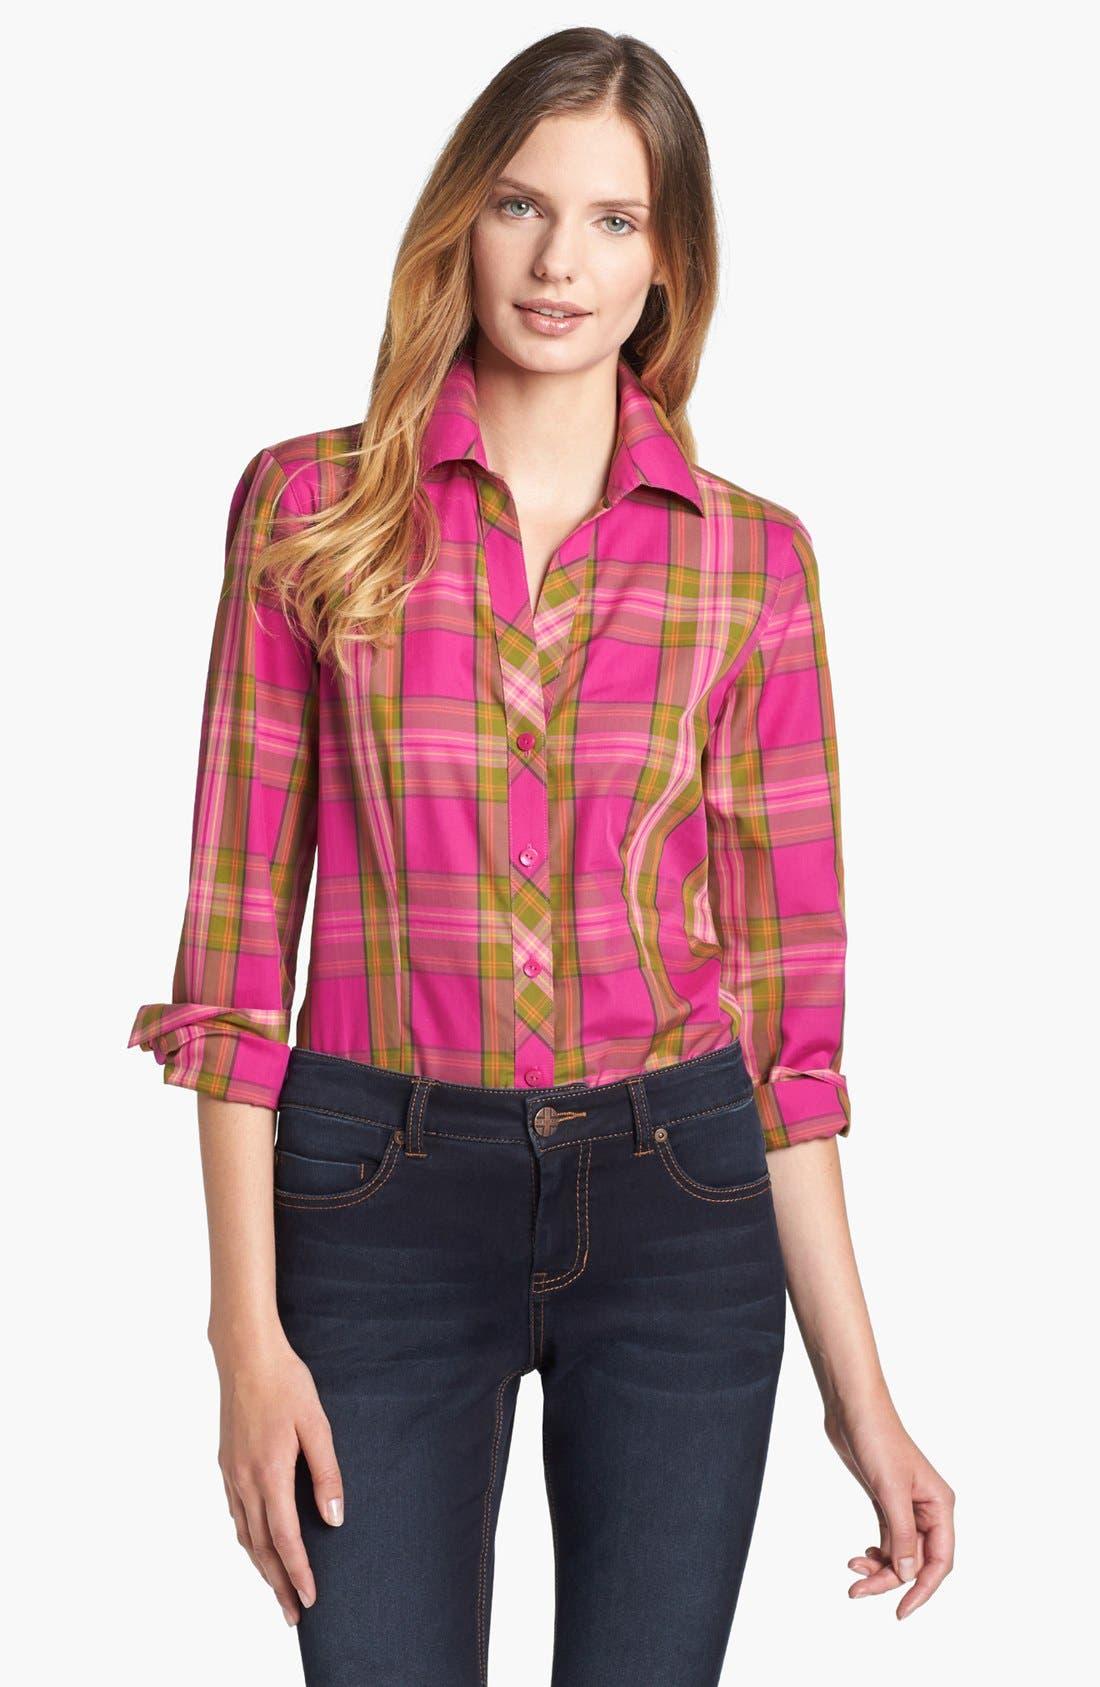 Alternate Image 1 Selected - Foxcroft 'Autumn Tartan' Woven Cotton Shirt (Petite)